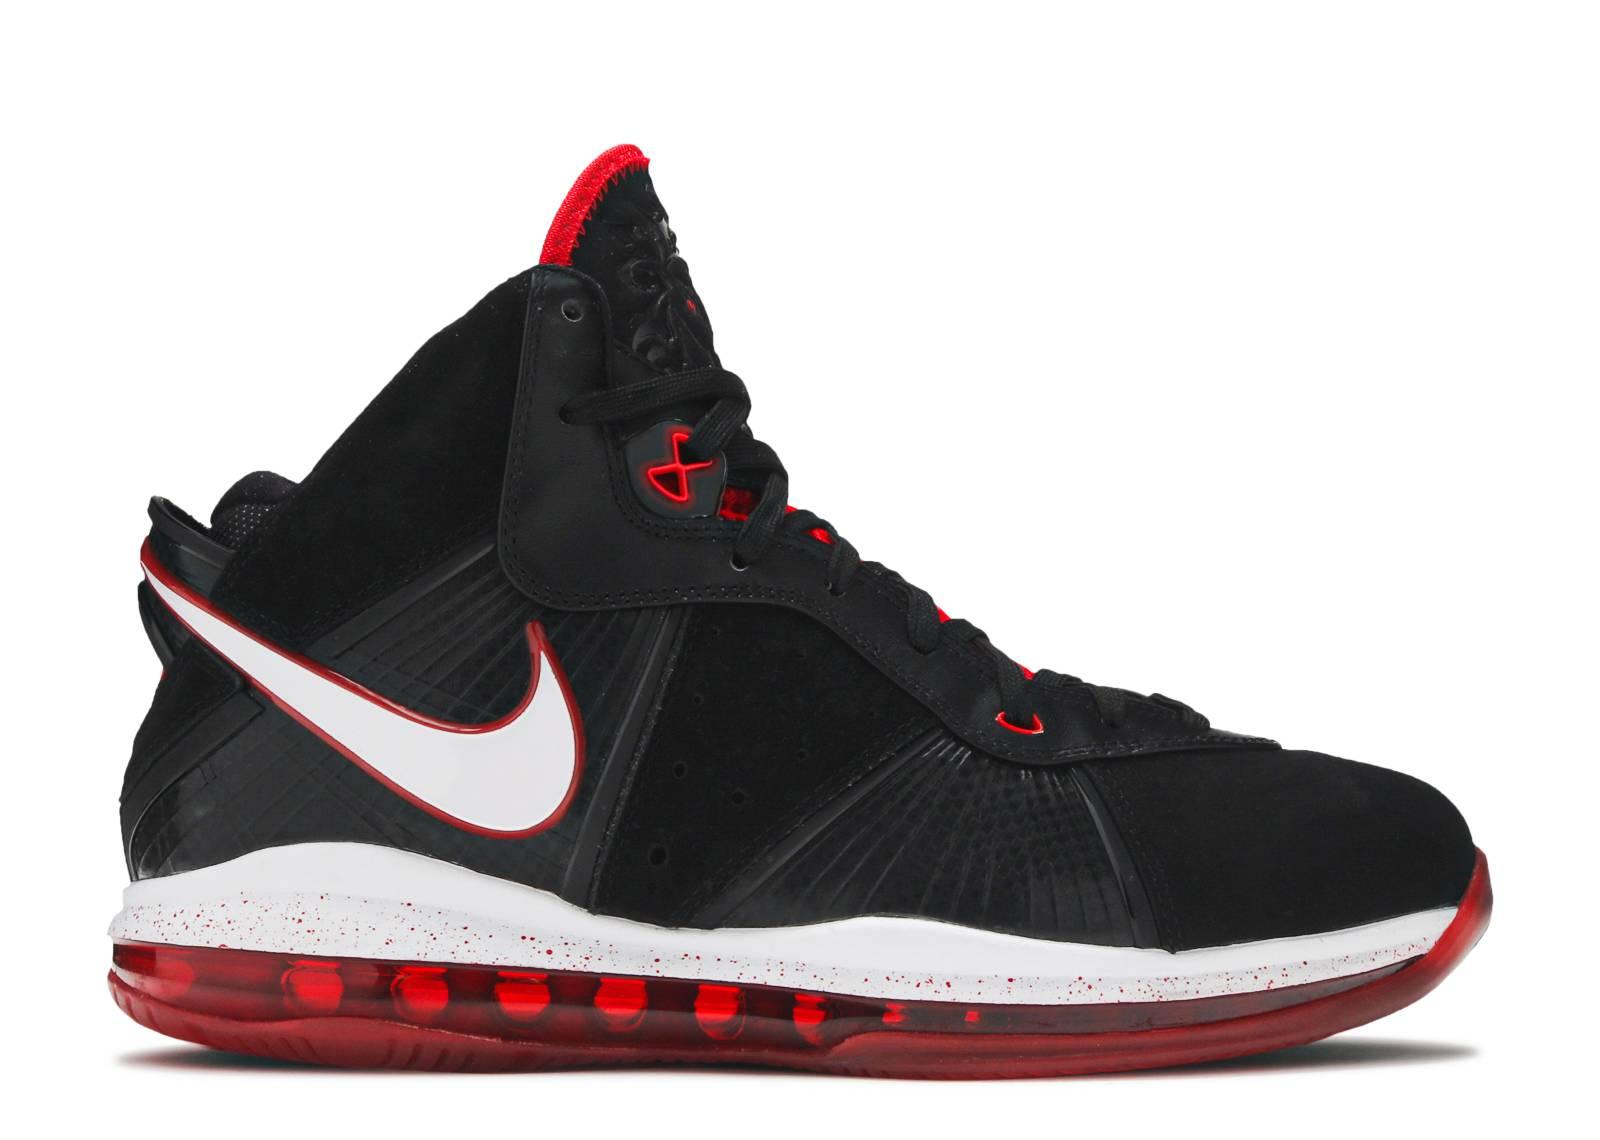 new arrivals 6fcf2 ebc1f Lebron James - Nike Basketball - Nike | Flight Club